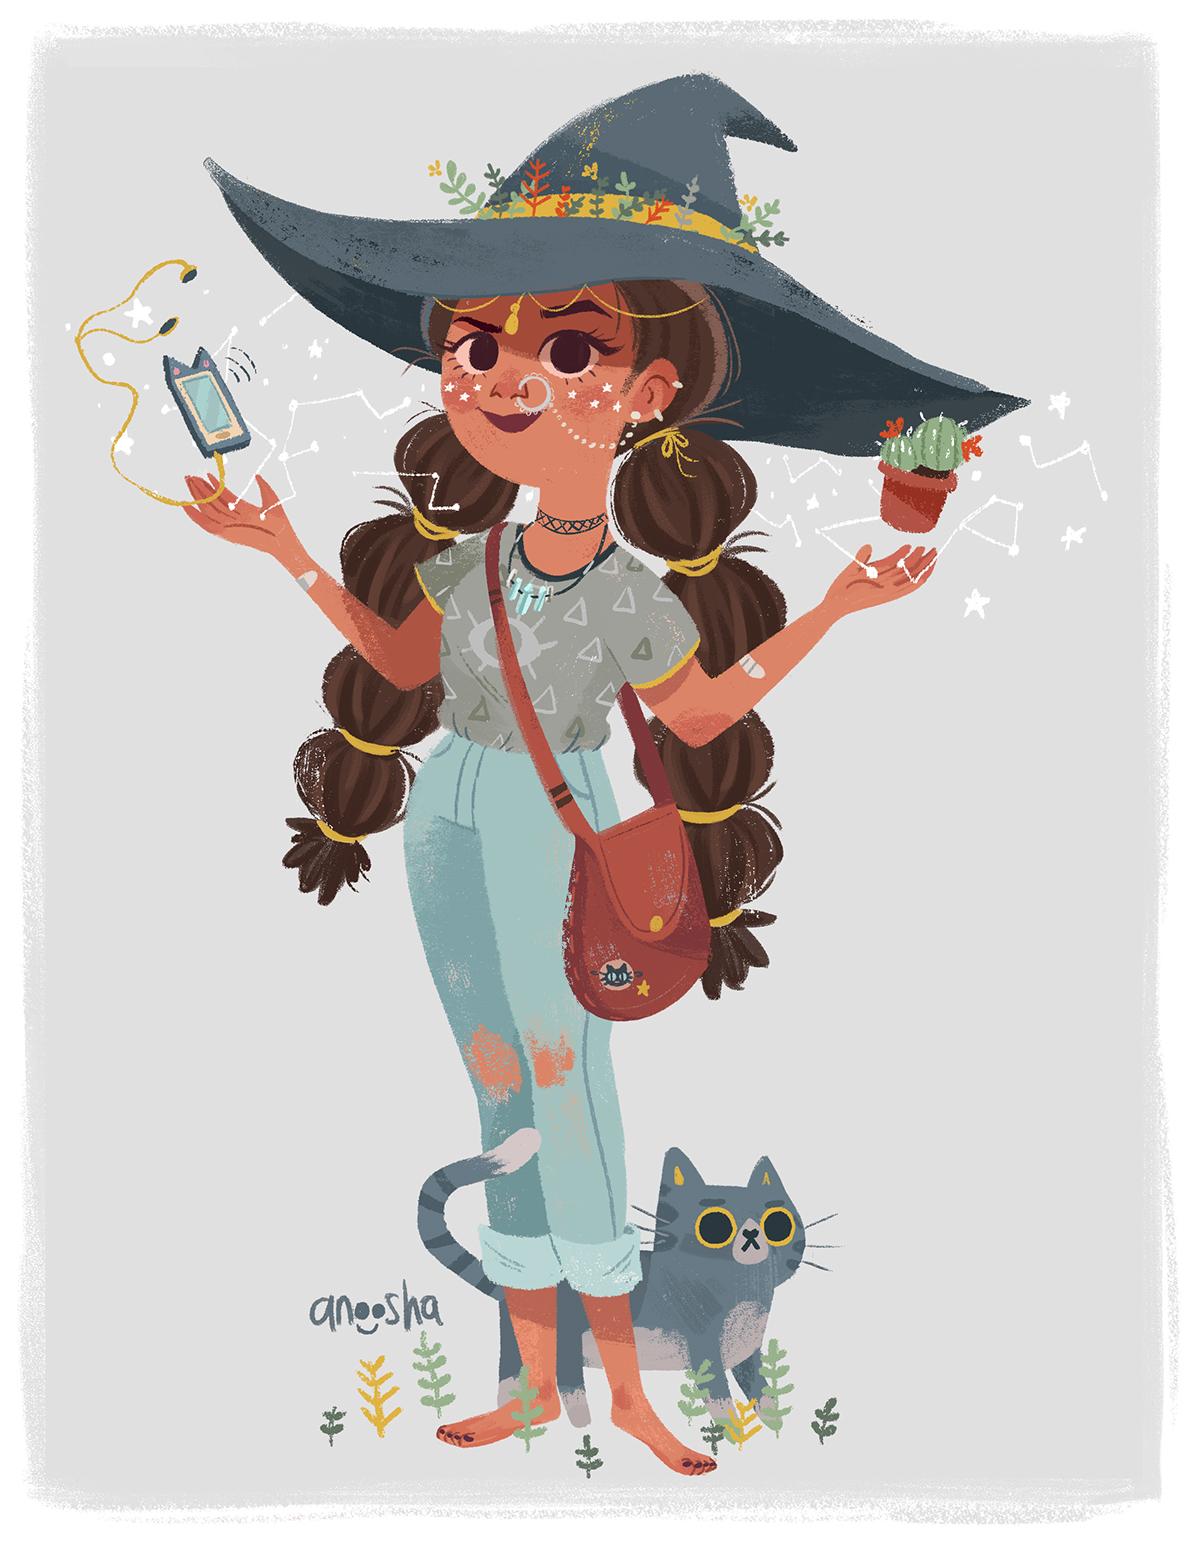 Character Design Jobs Toronto : Girls on behance